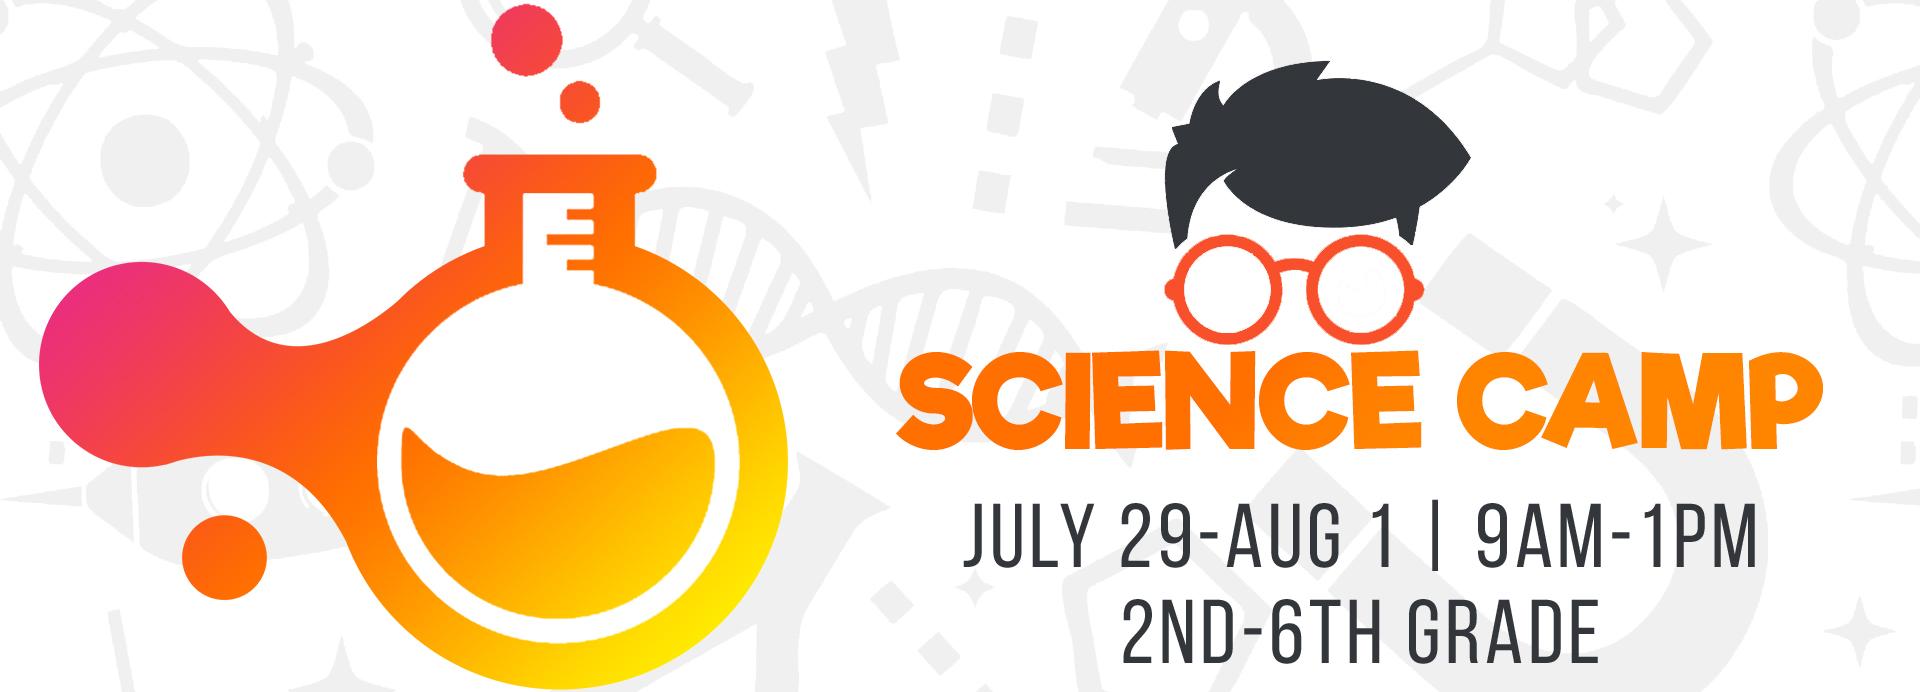 1920x692 Science Camp.jpg